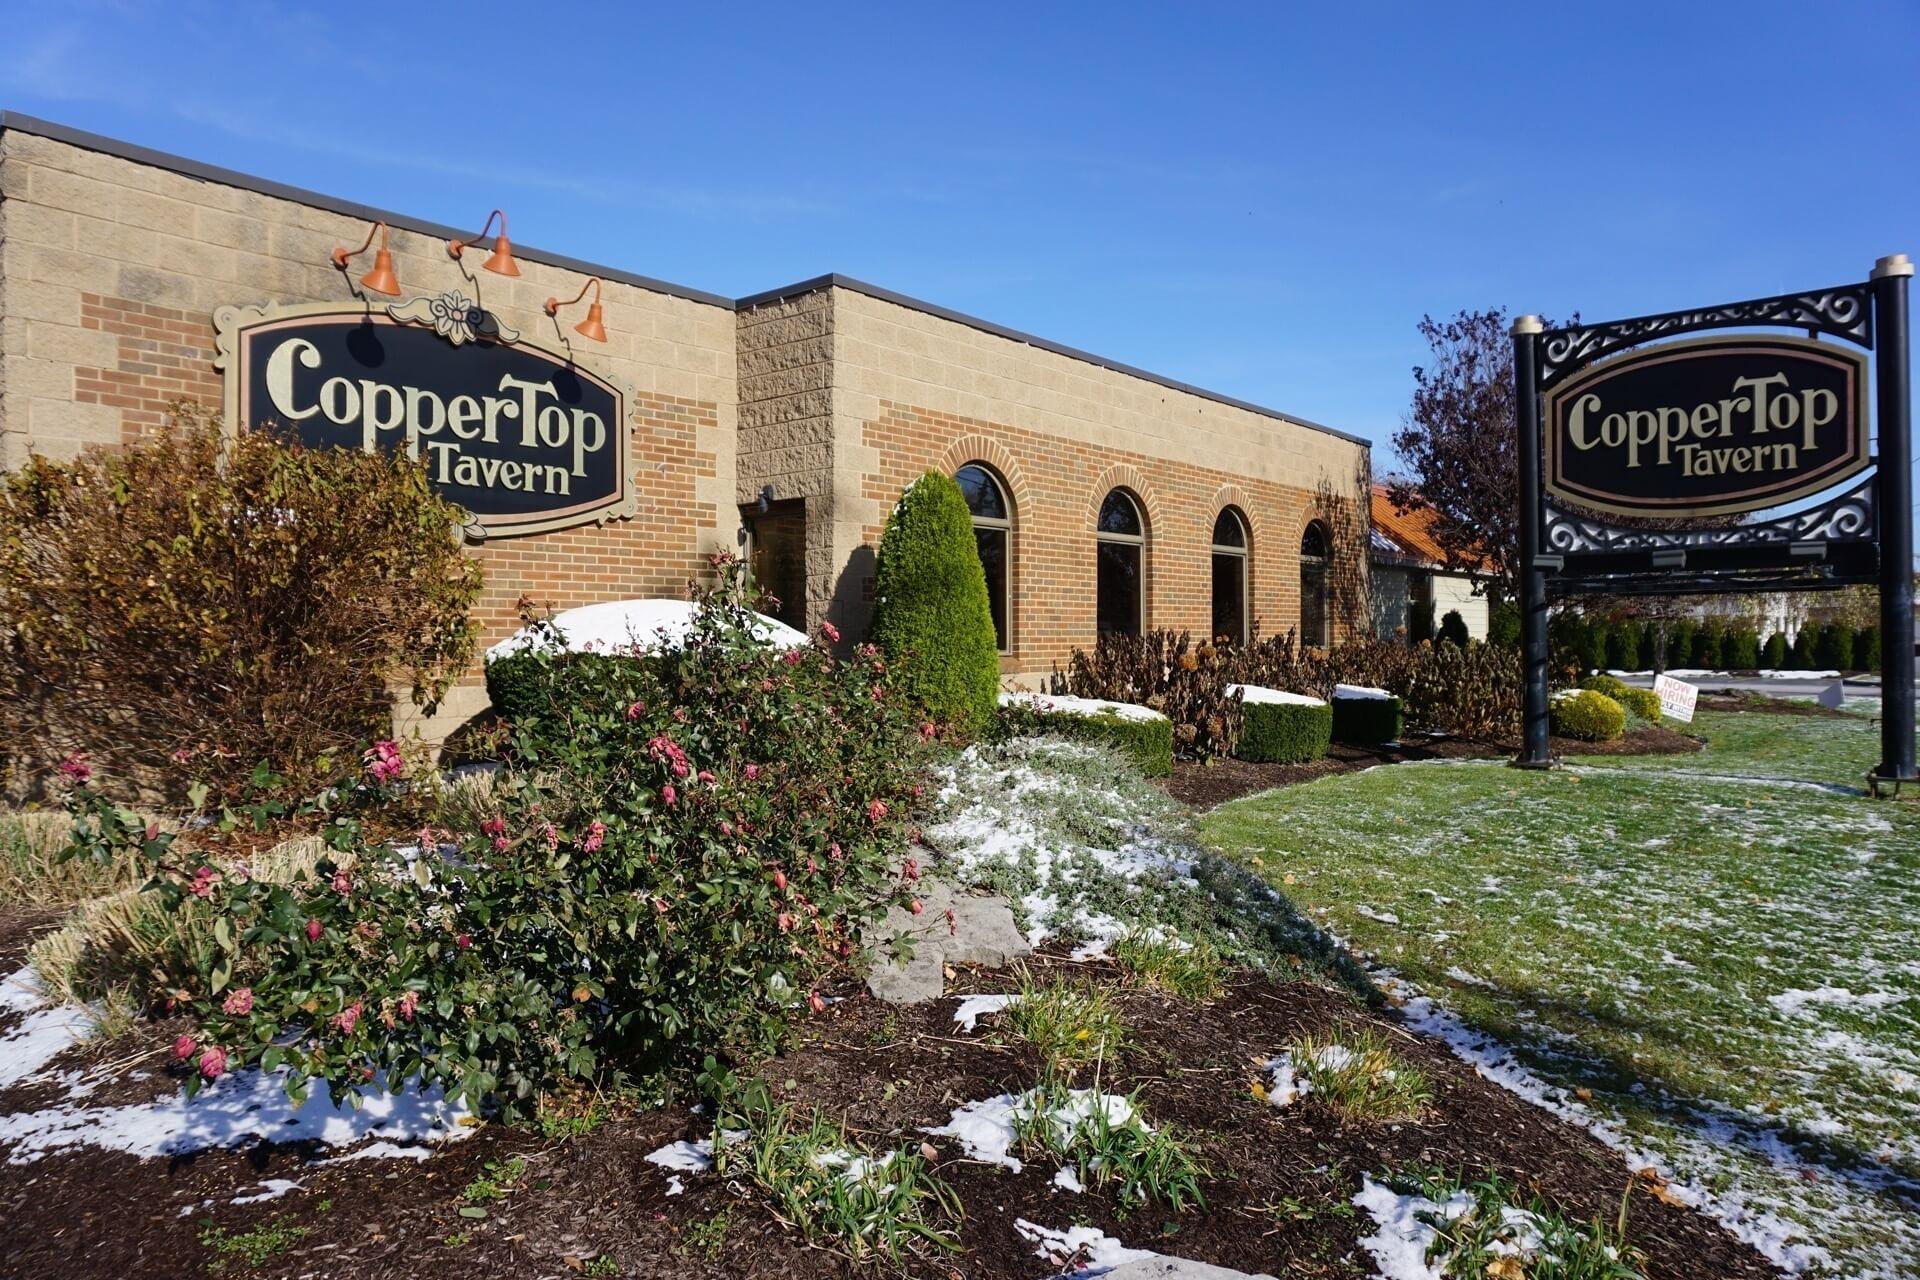 CopperTop Tavern in Camilus, NY